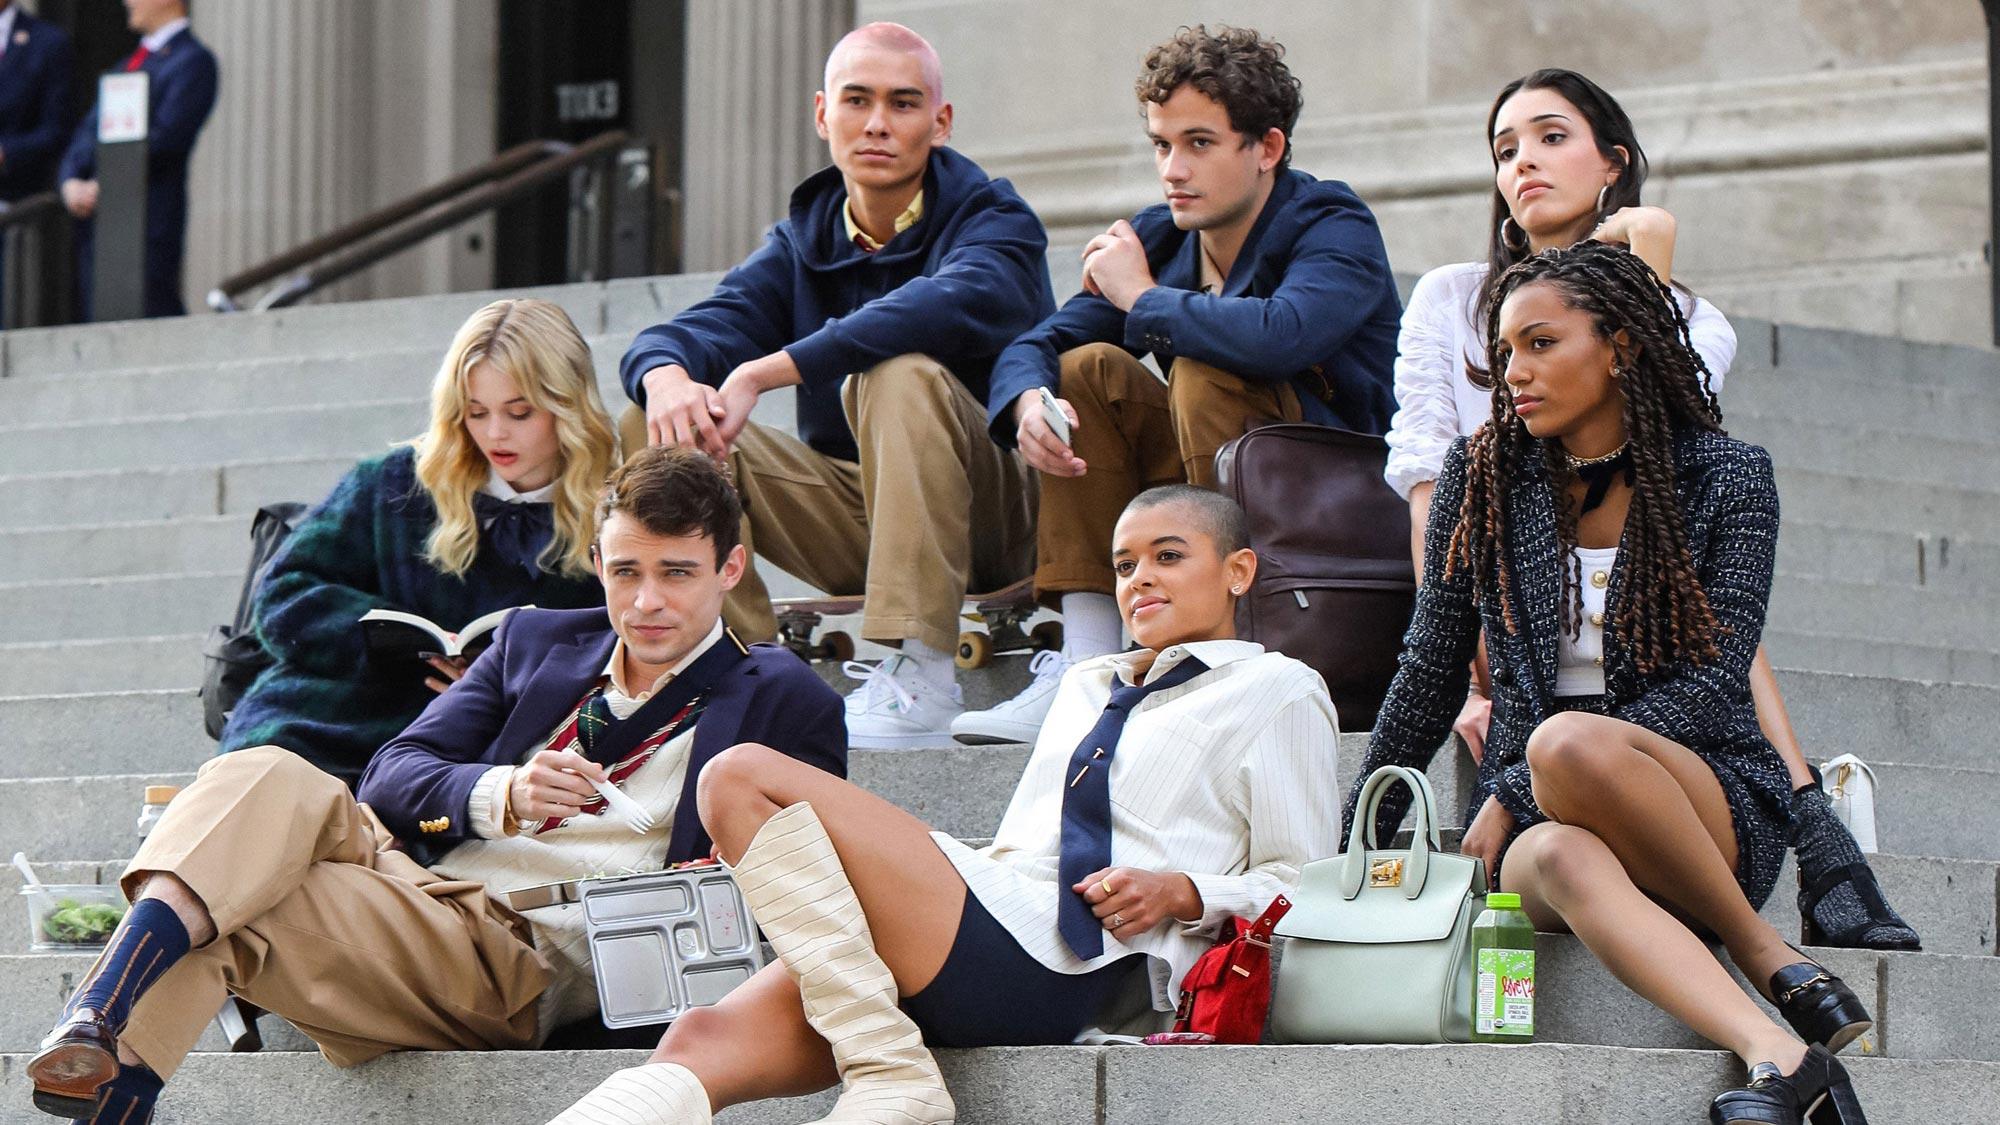 Gossip Girl reboot on HBO Max